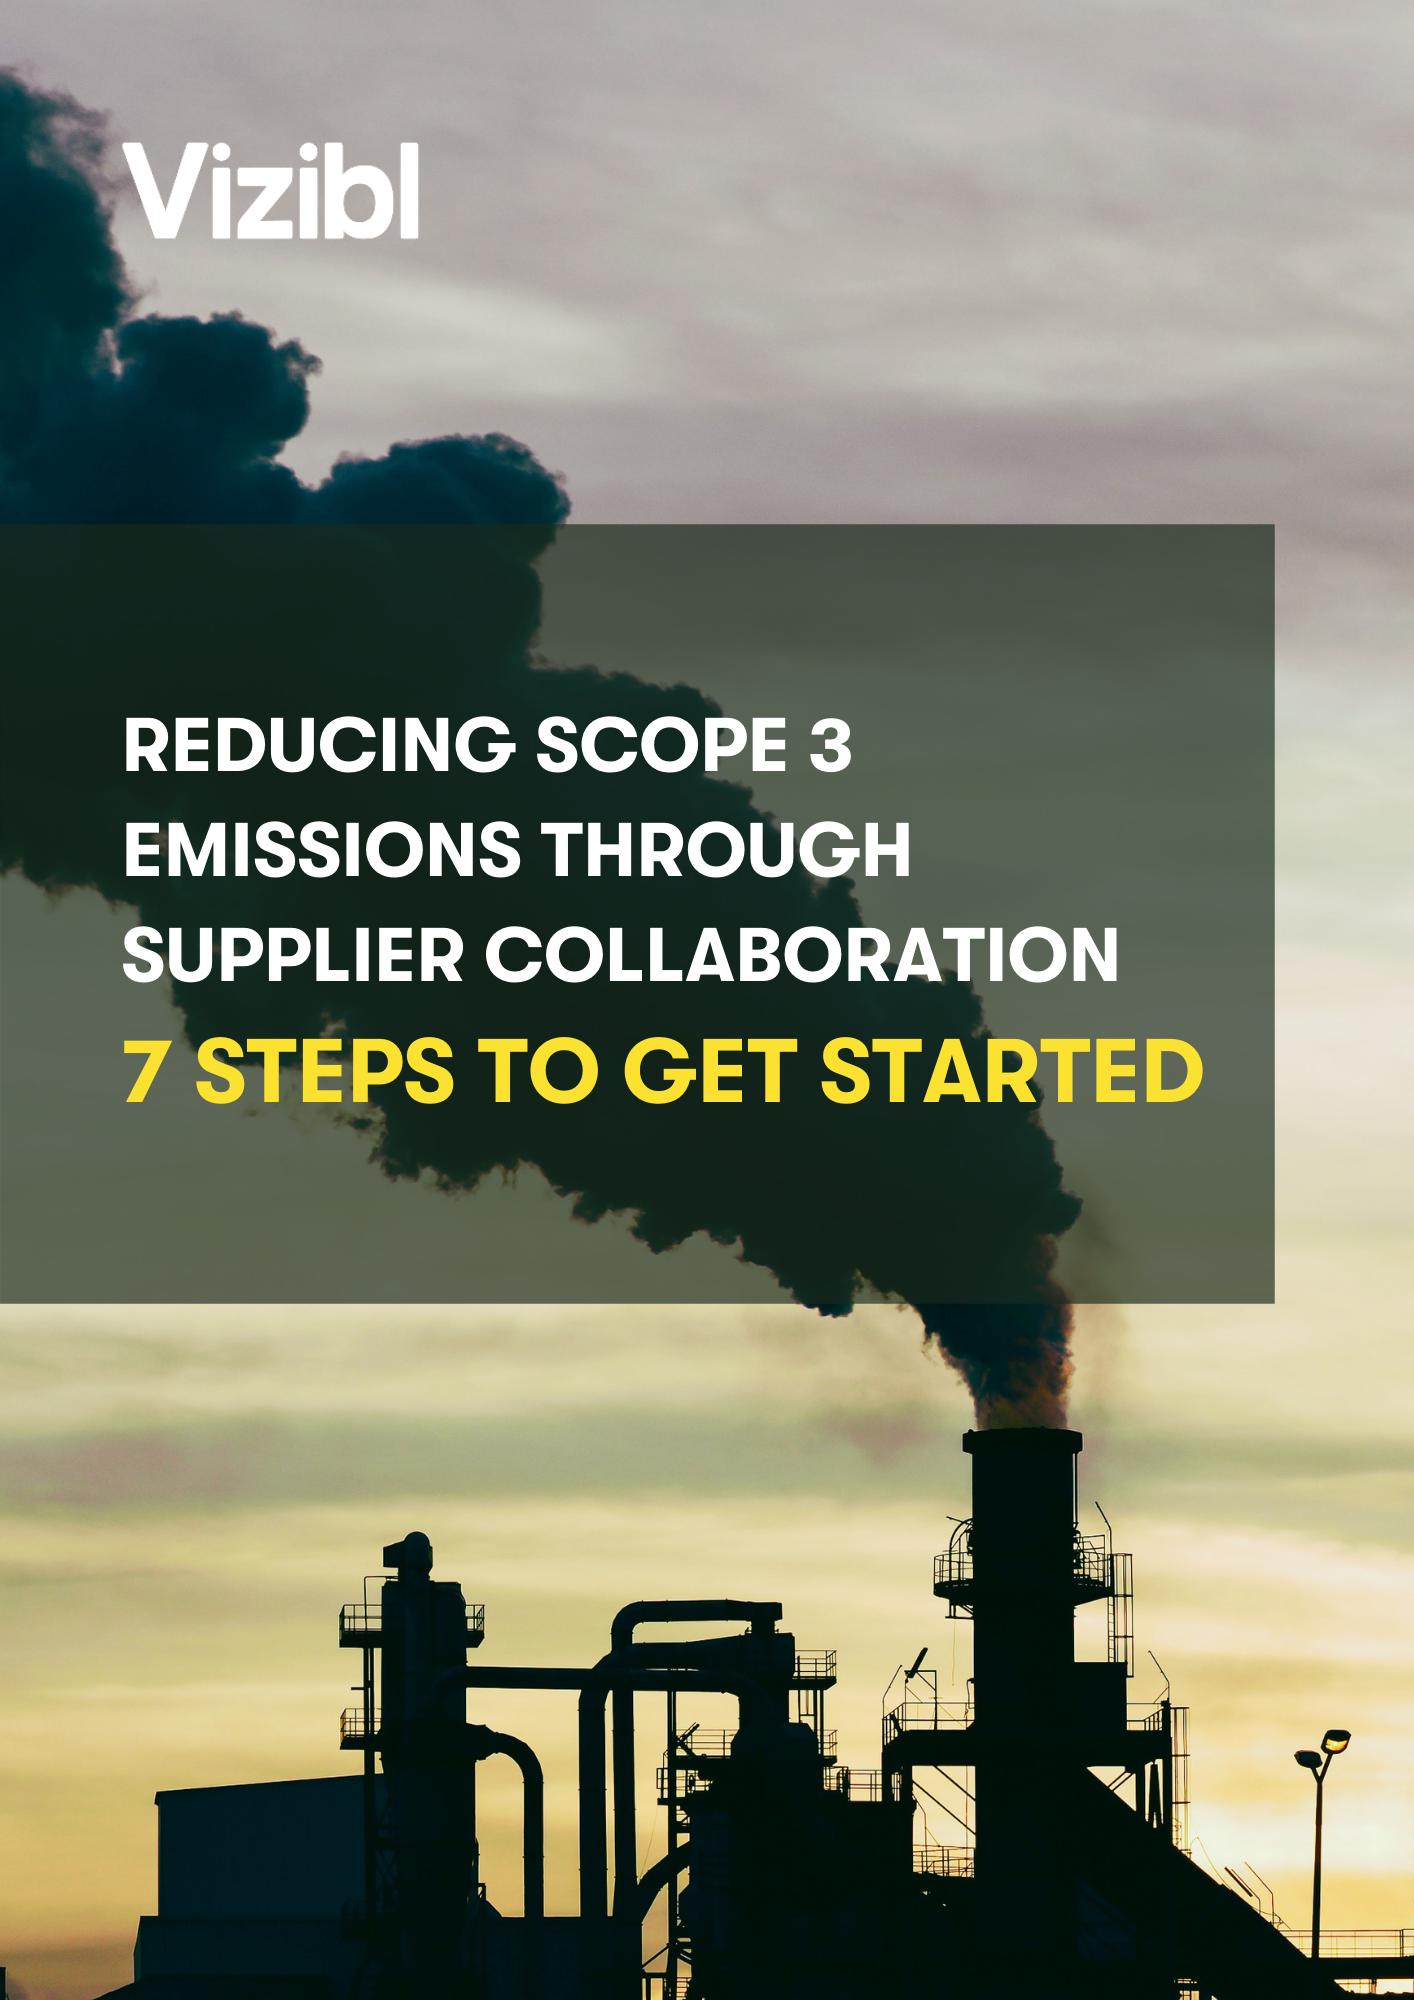 FINAL - 7 Steps Supplier Collaboration Scope 3